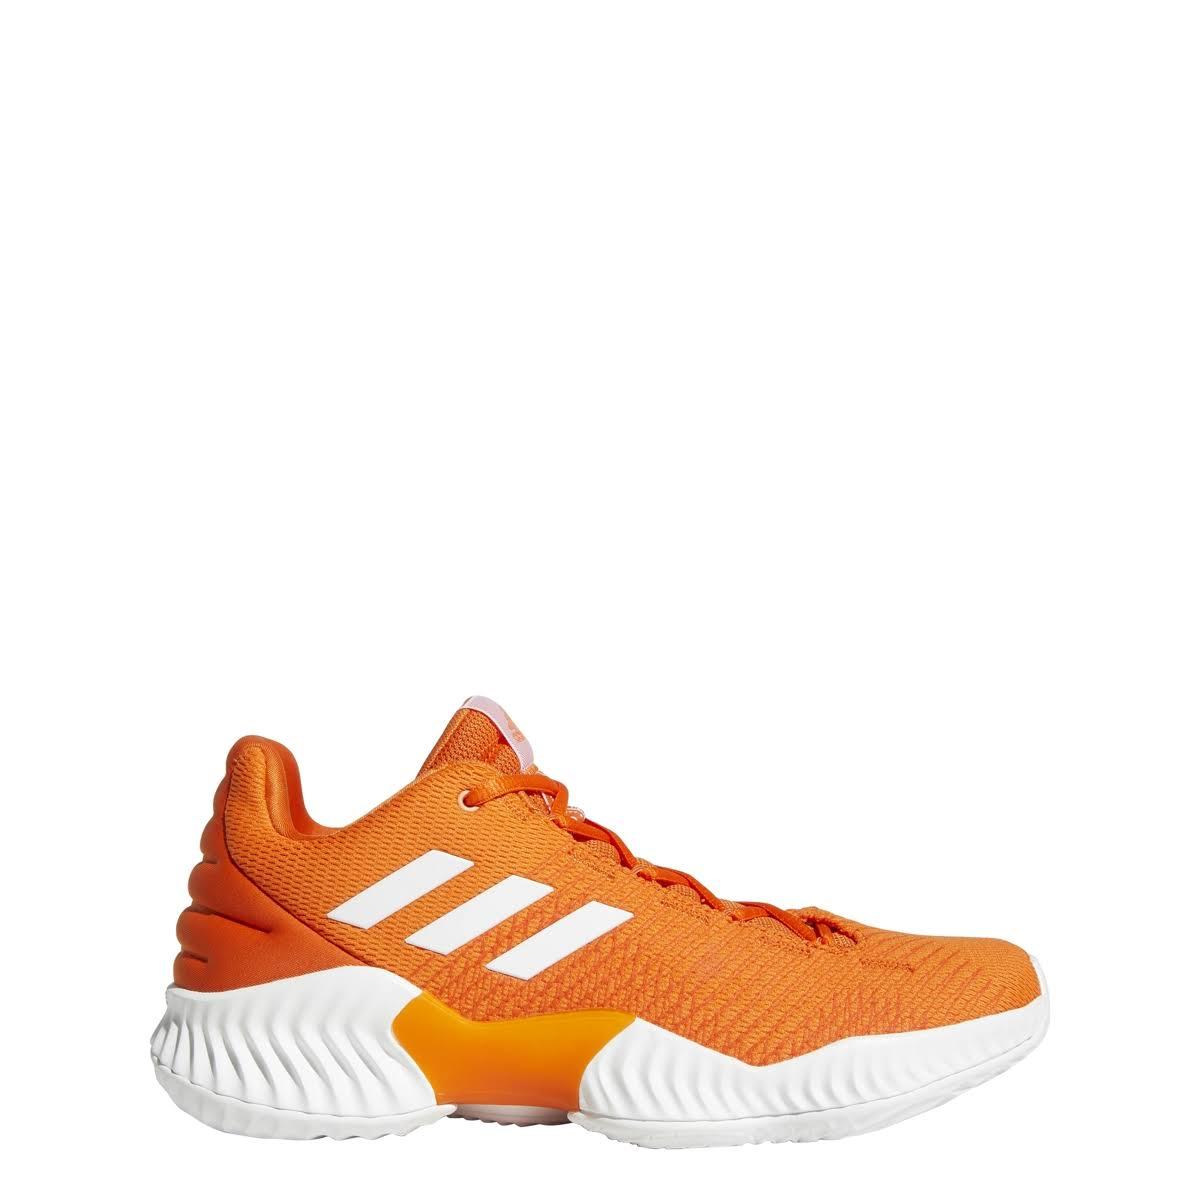 Low 2018 Baloncesto Para Pro Adidas Hombre Bounce Shoe wRwgxZ64